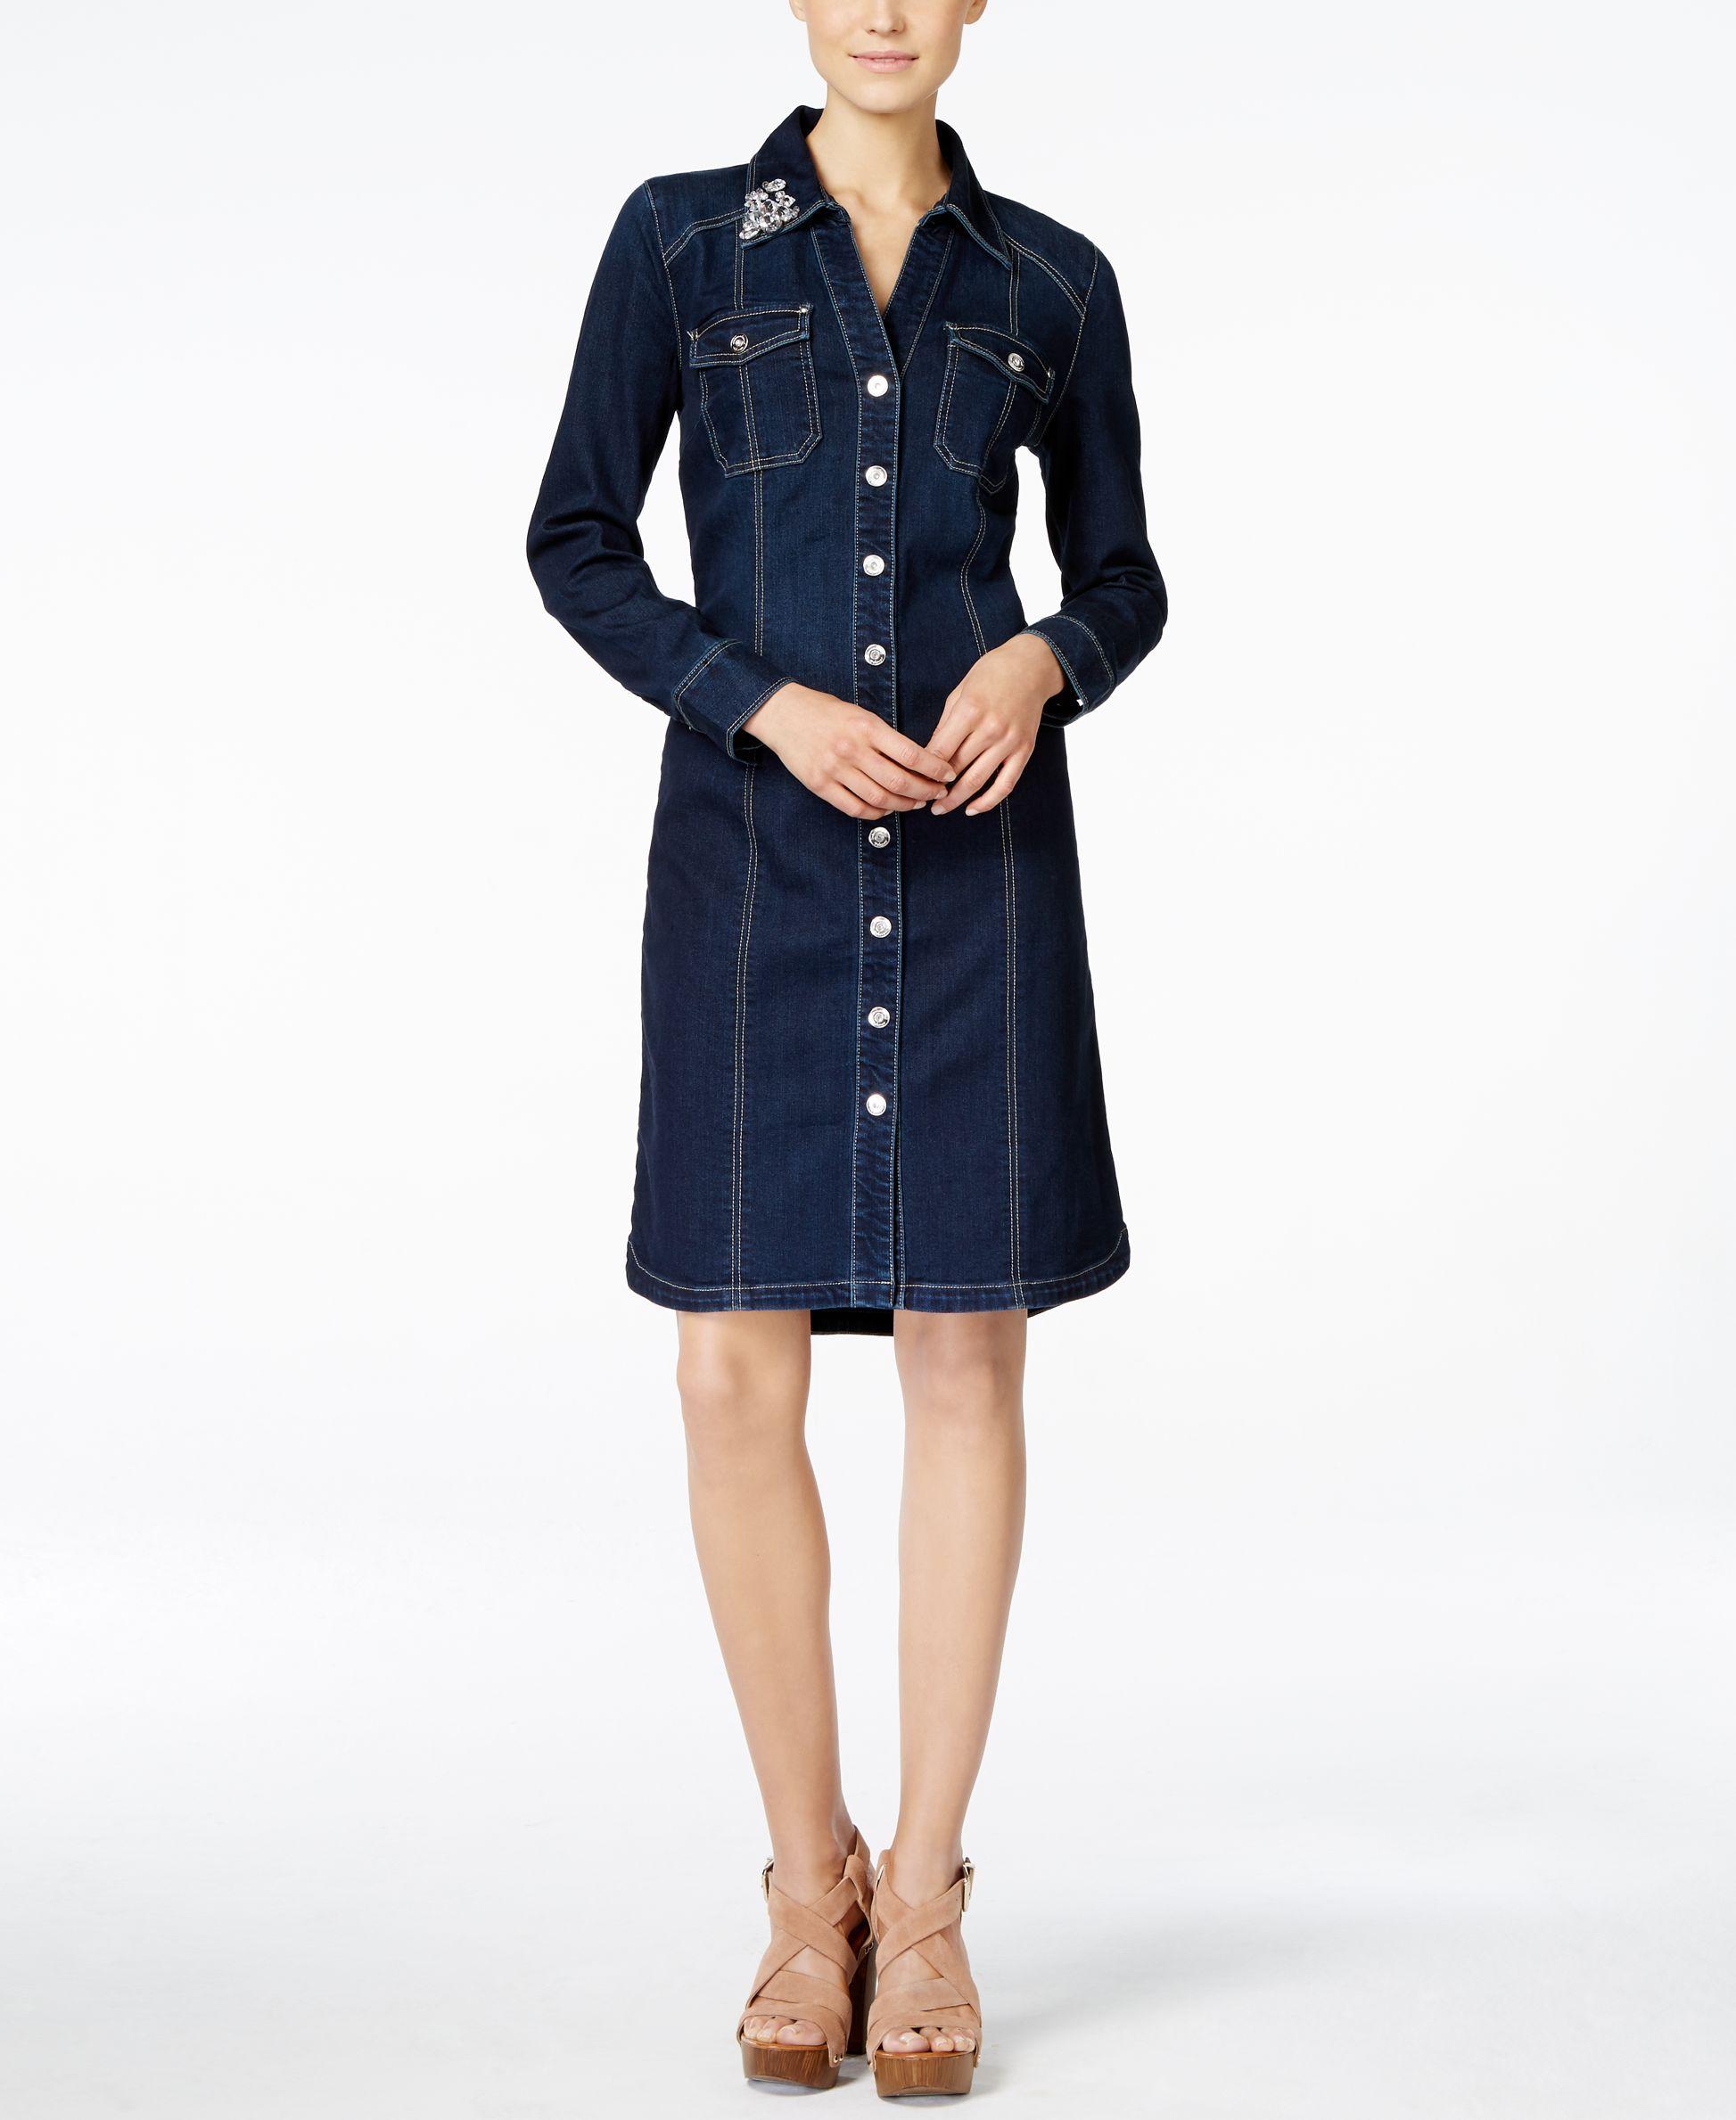 d812968595 Inc International Concepts Petite Embellished Indigo Wash Denim Shirt Dress